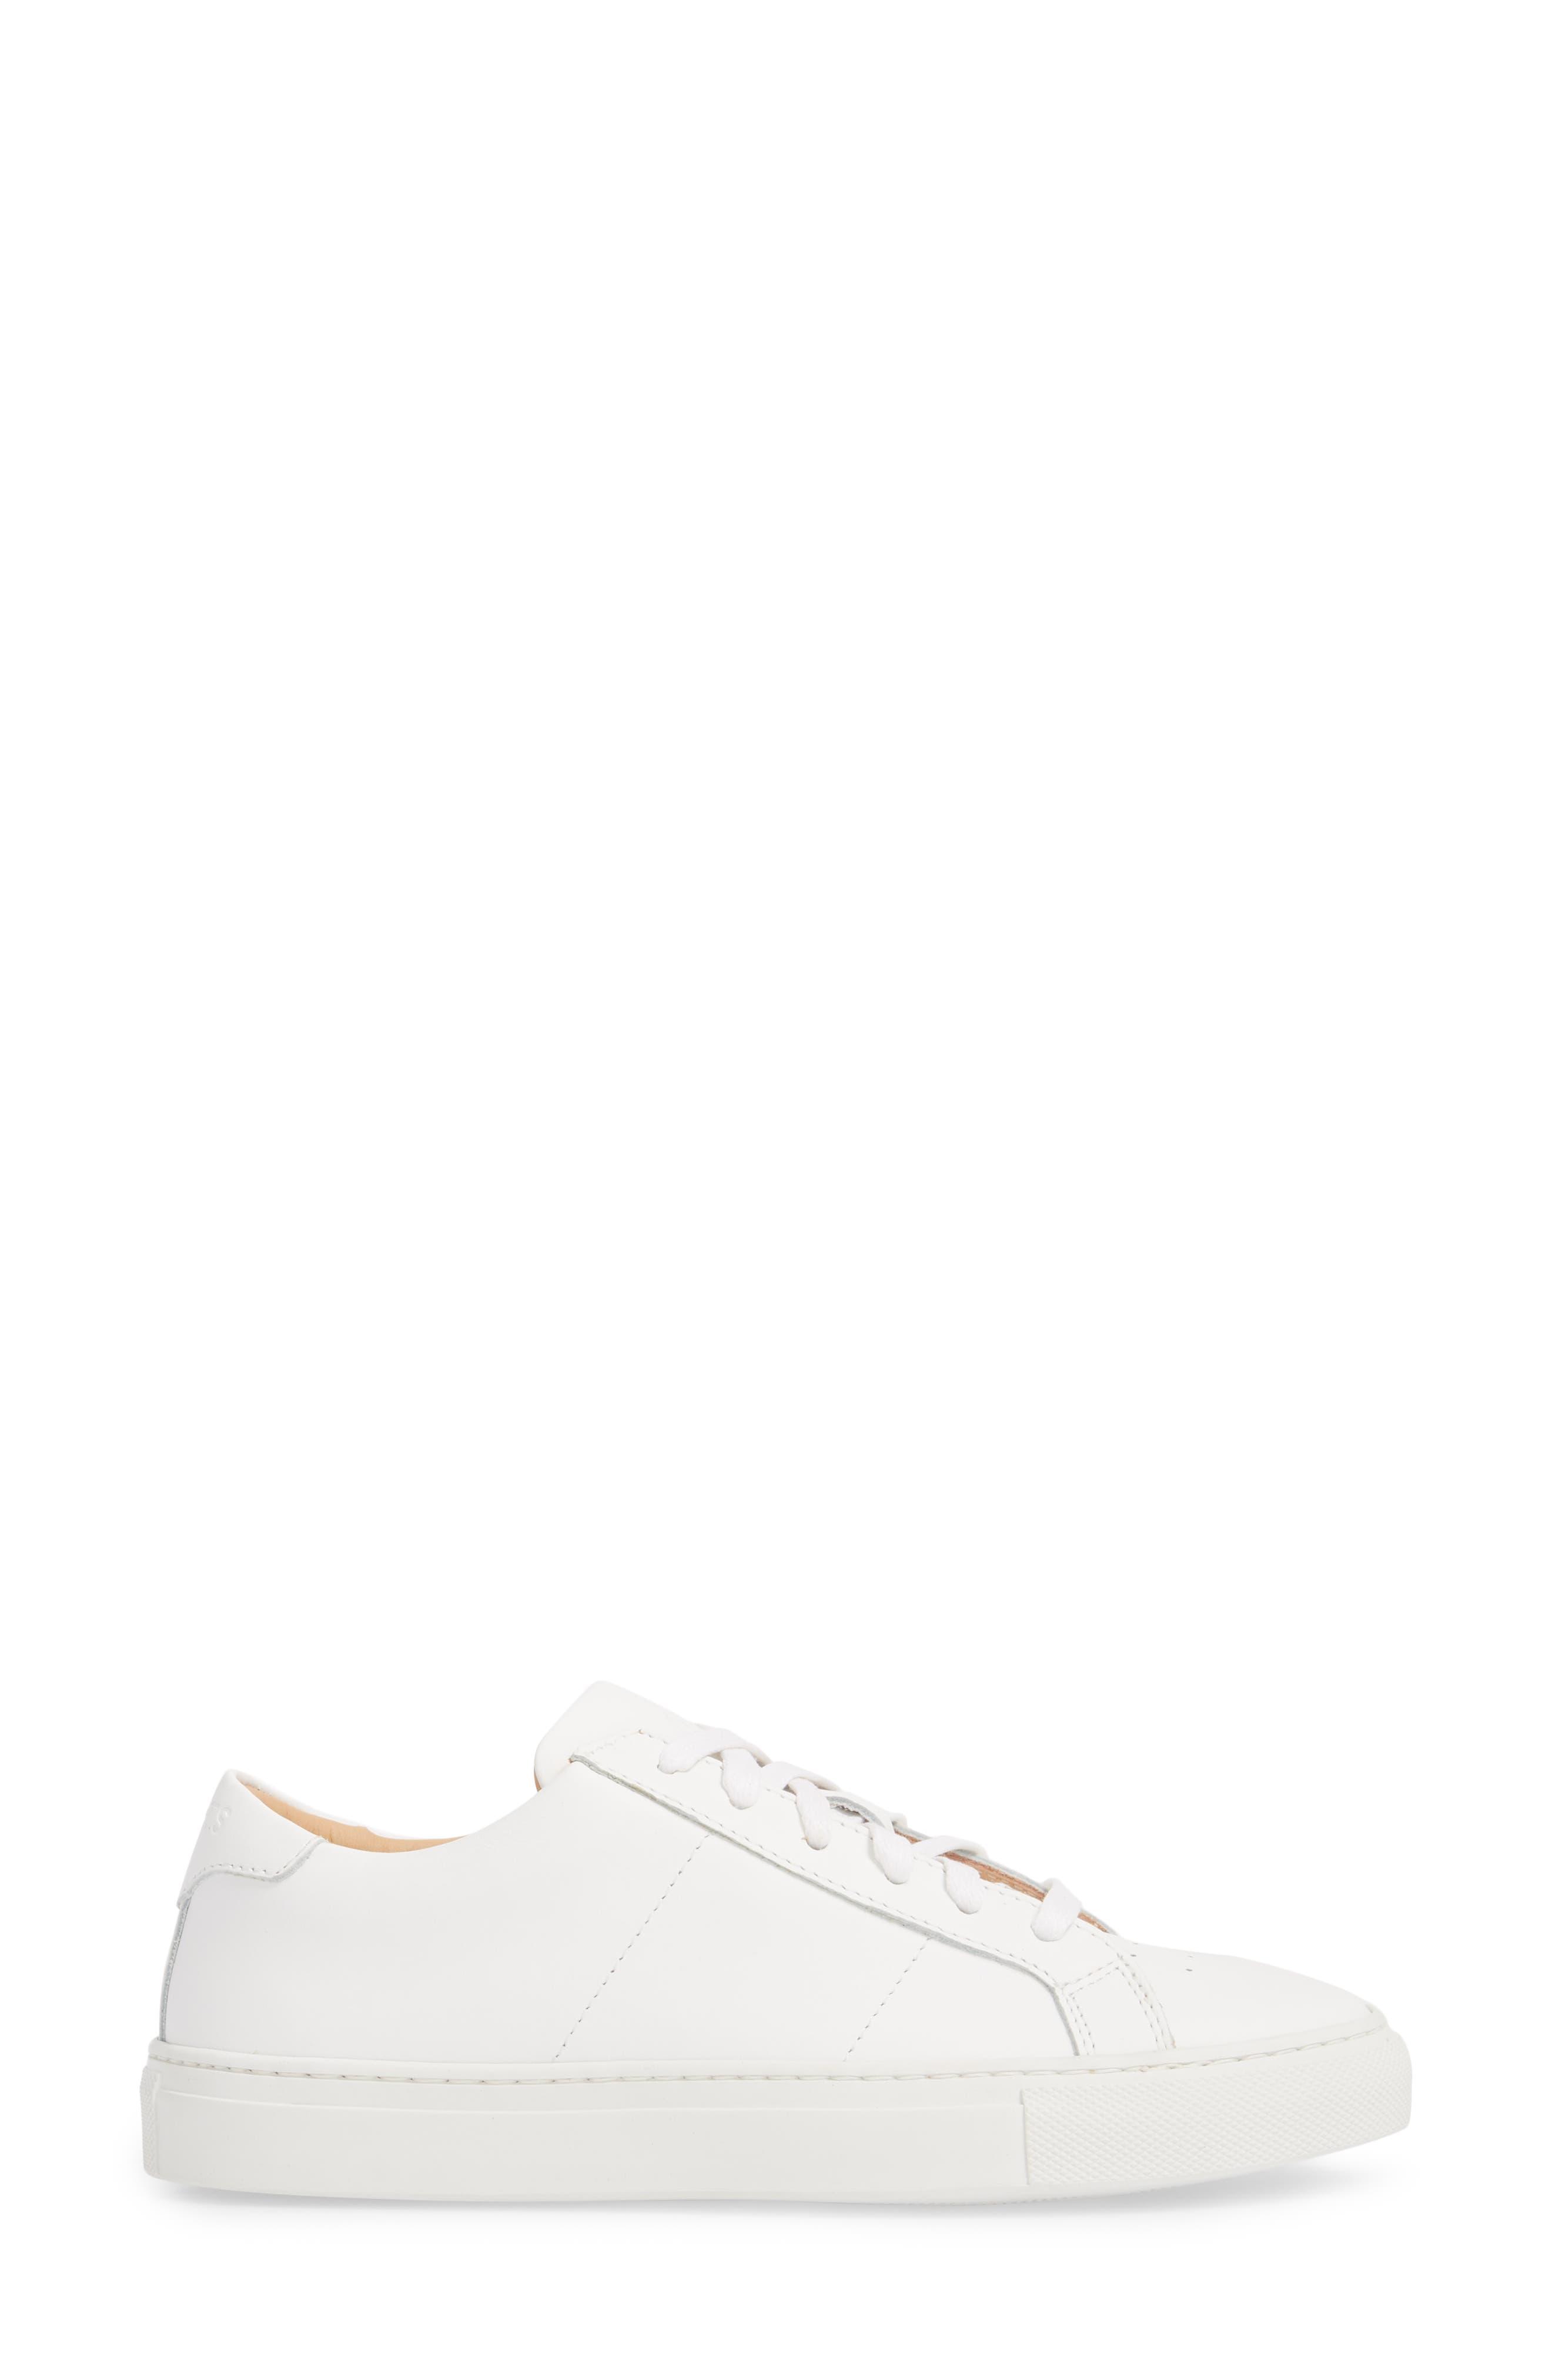 Royale Sneaker,                             Alternate thumbnail 3, color,